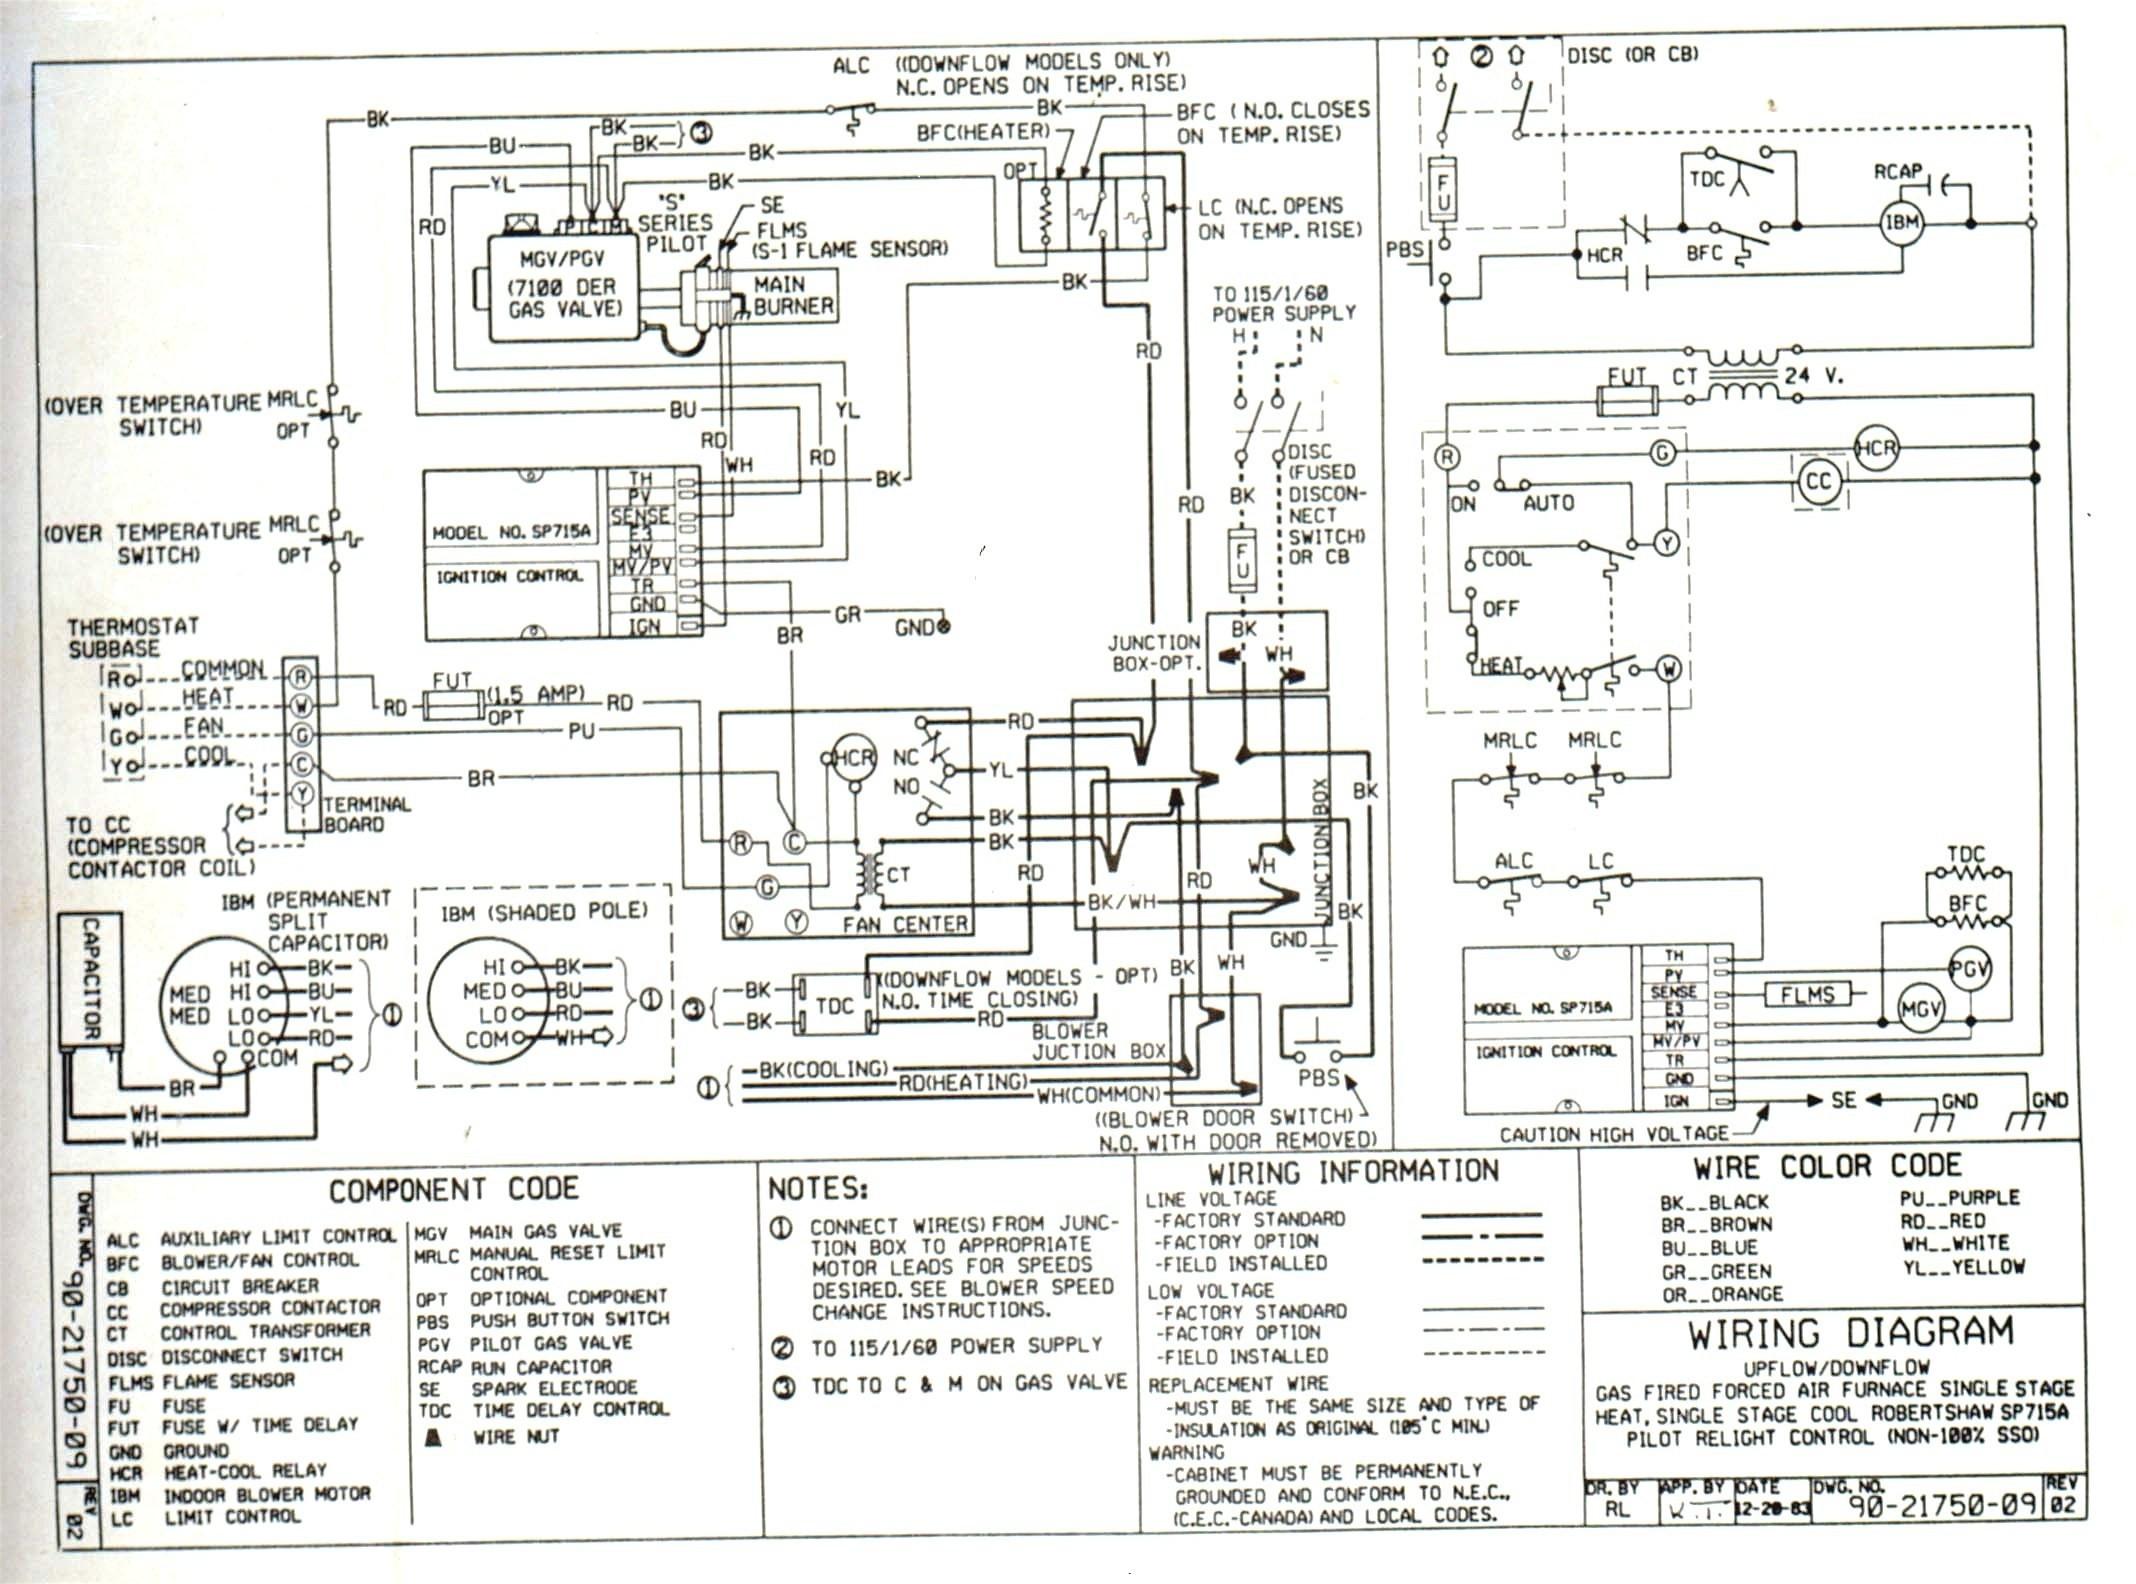 4020 12 Volt Wiring Diagram F287 115v Breaker Wiring Diagram Free Picture Schematic